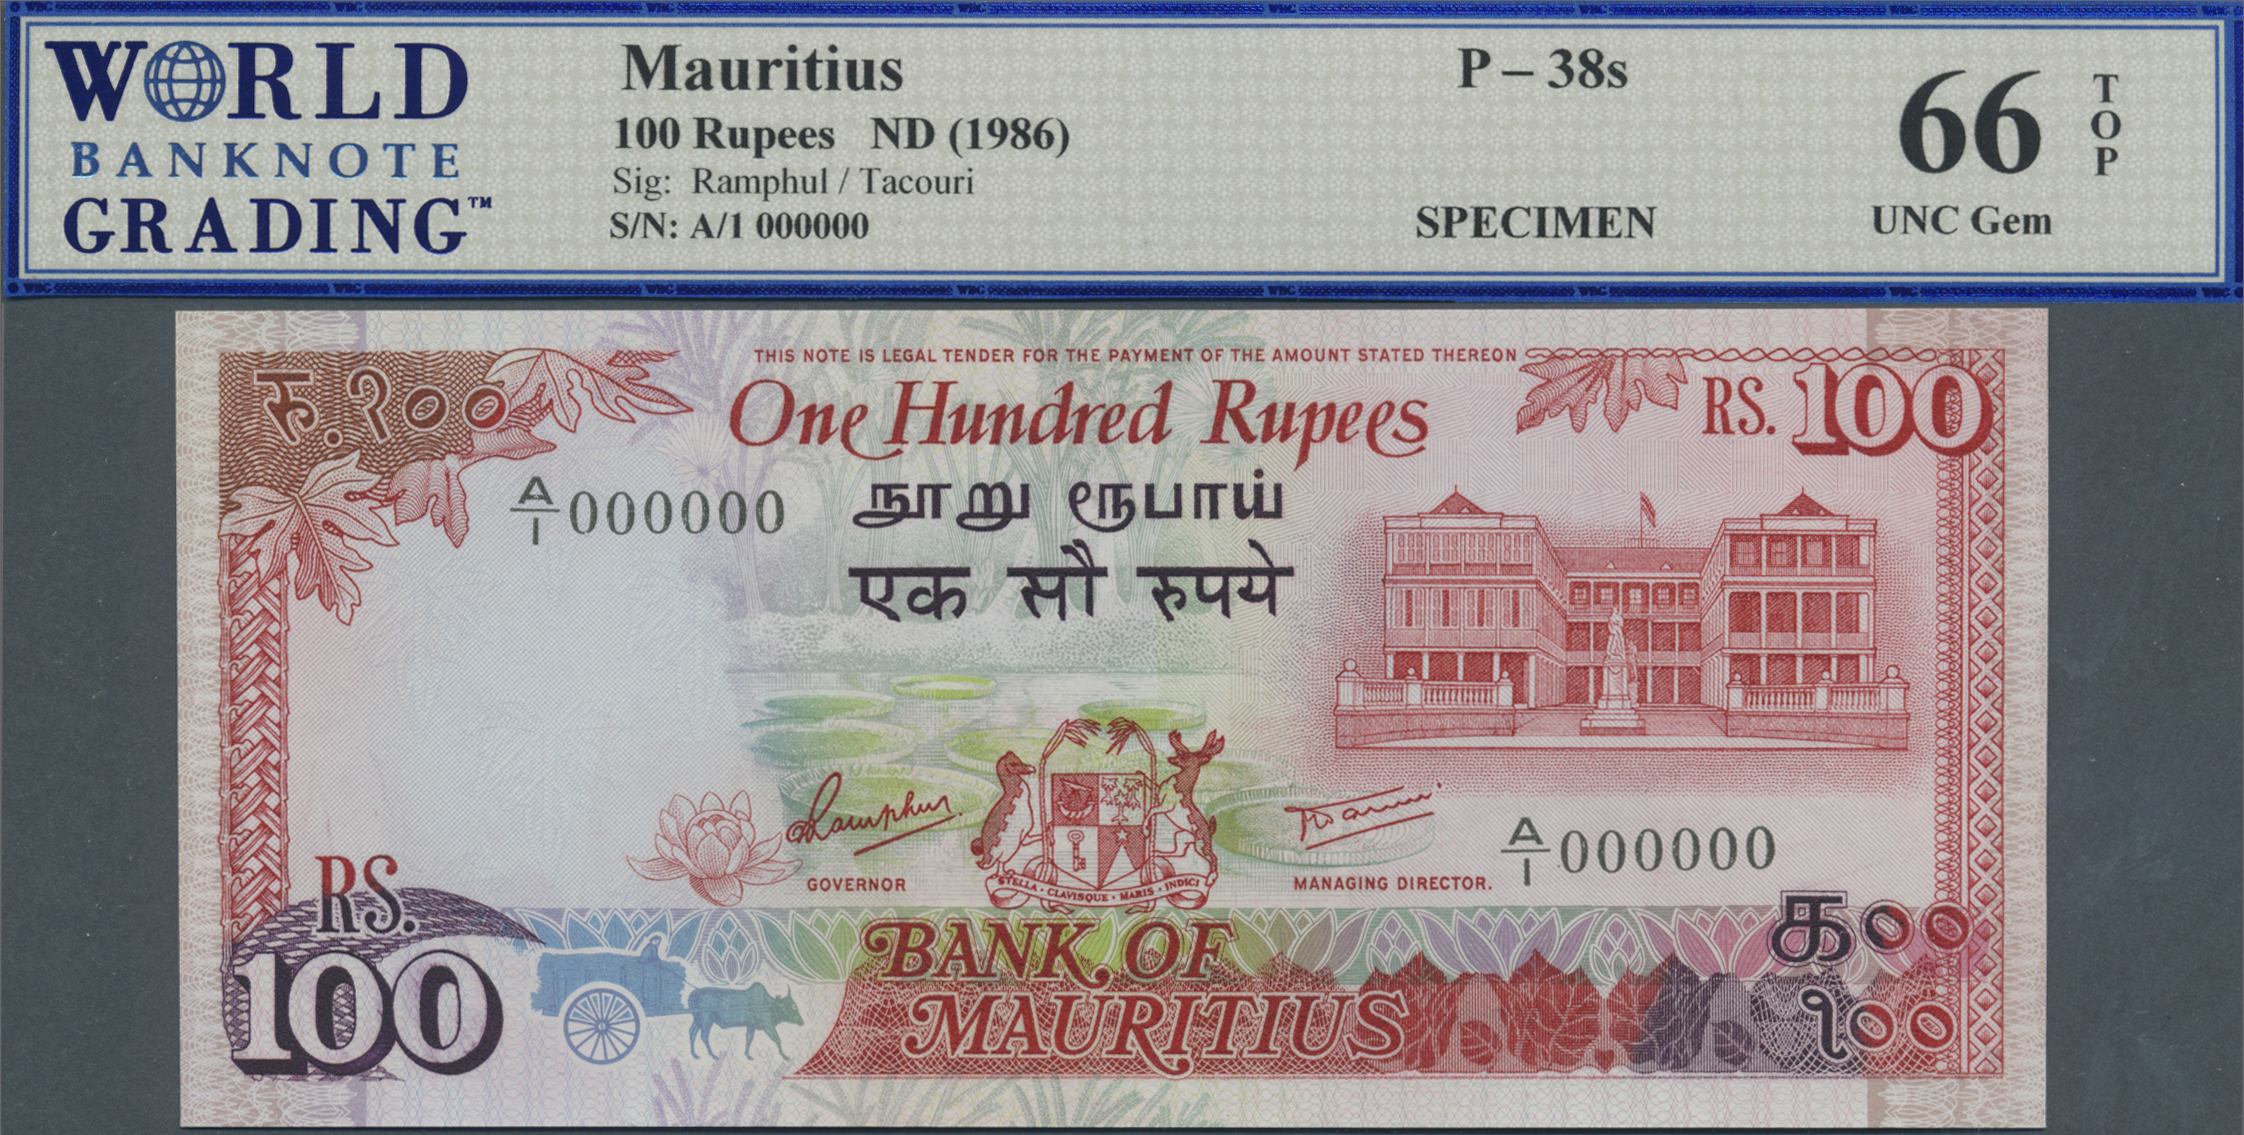 governor bank of mauritius